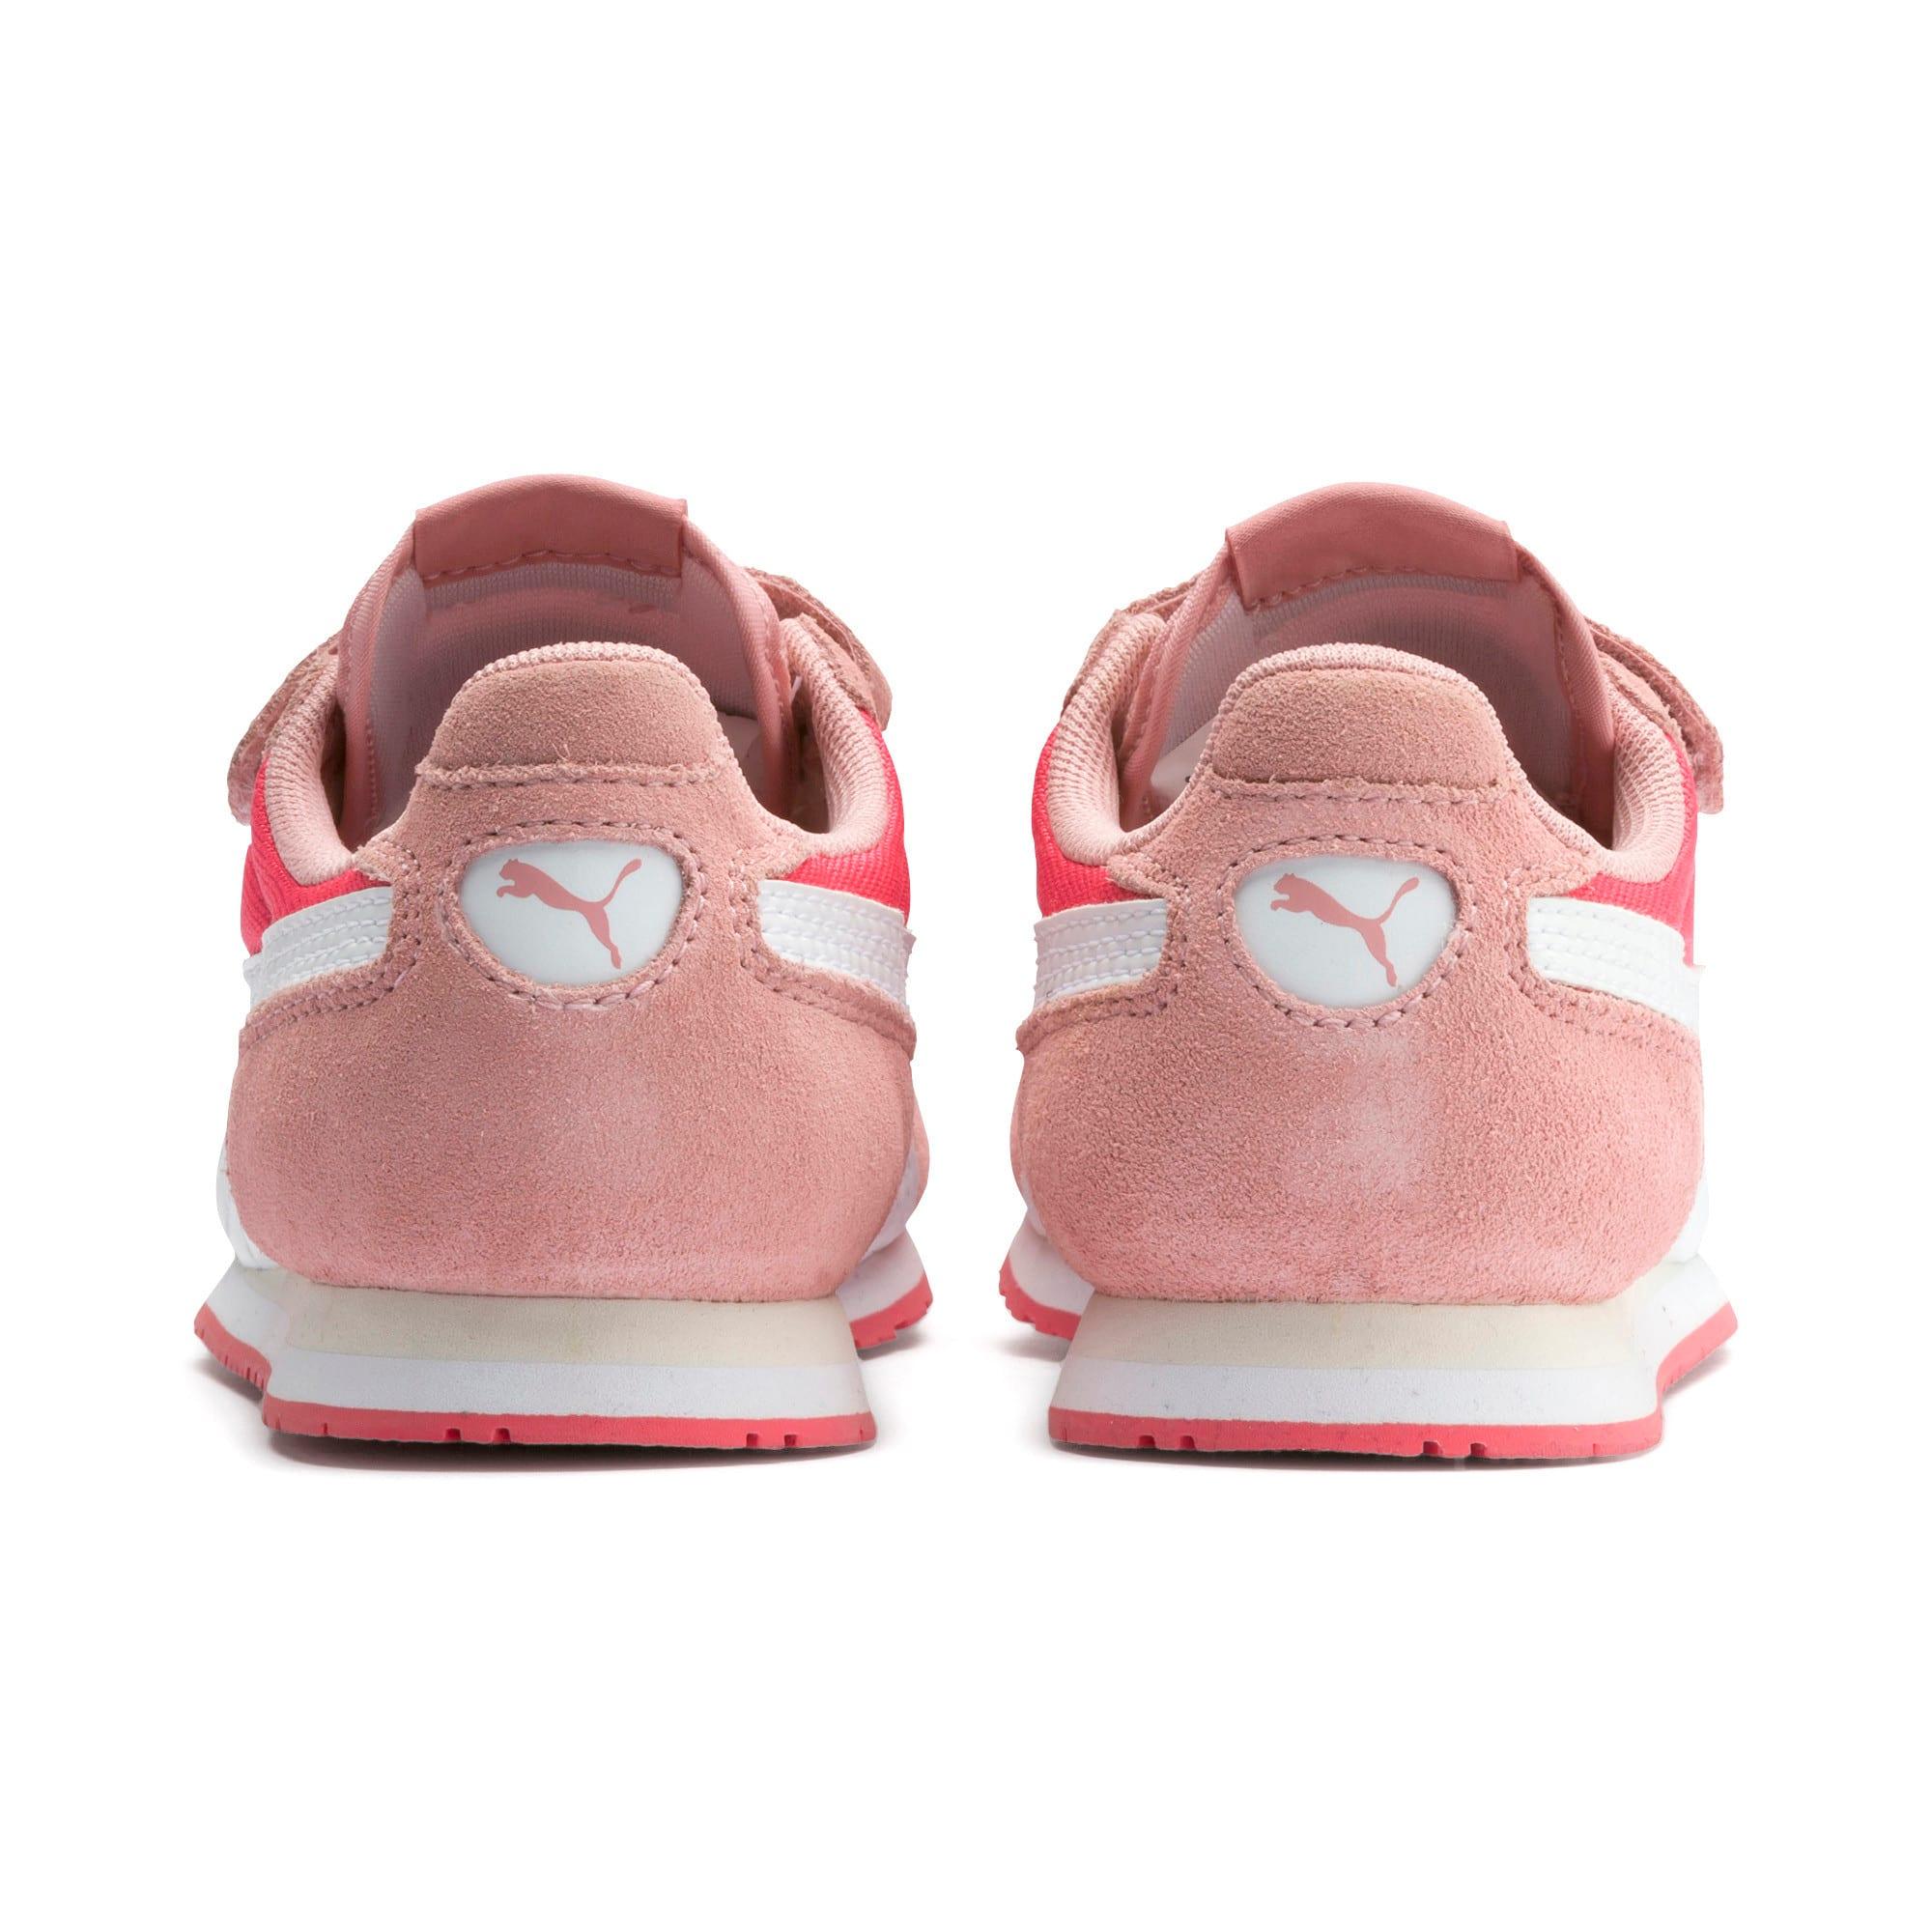 Miniatura 3 de Zapatos Cabana Racer para niño pequeño, Calypso Coral-Bridal Rose, mediano